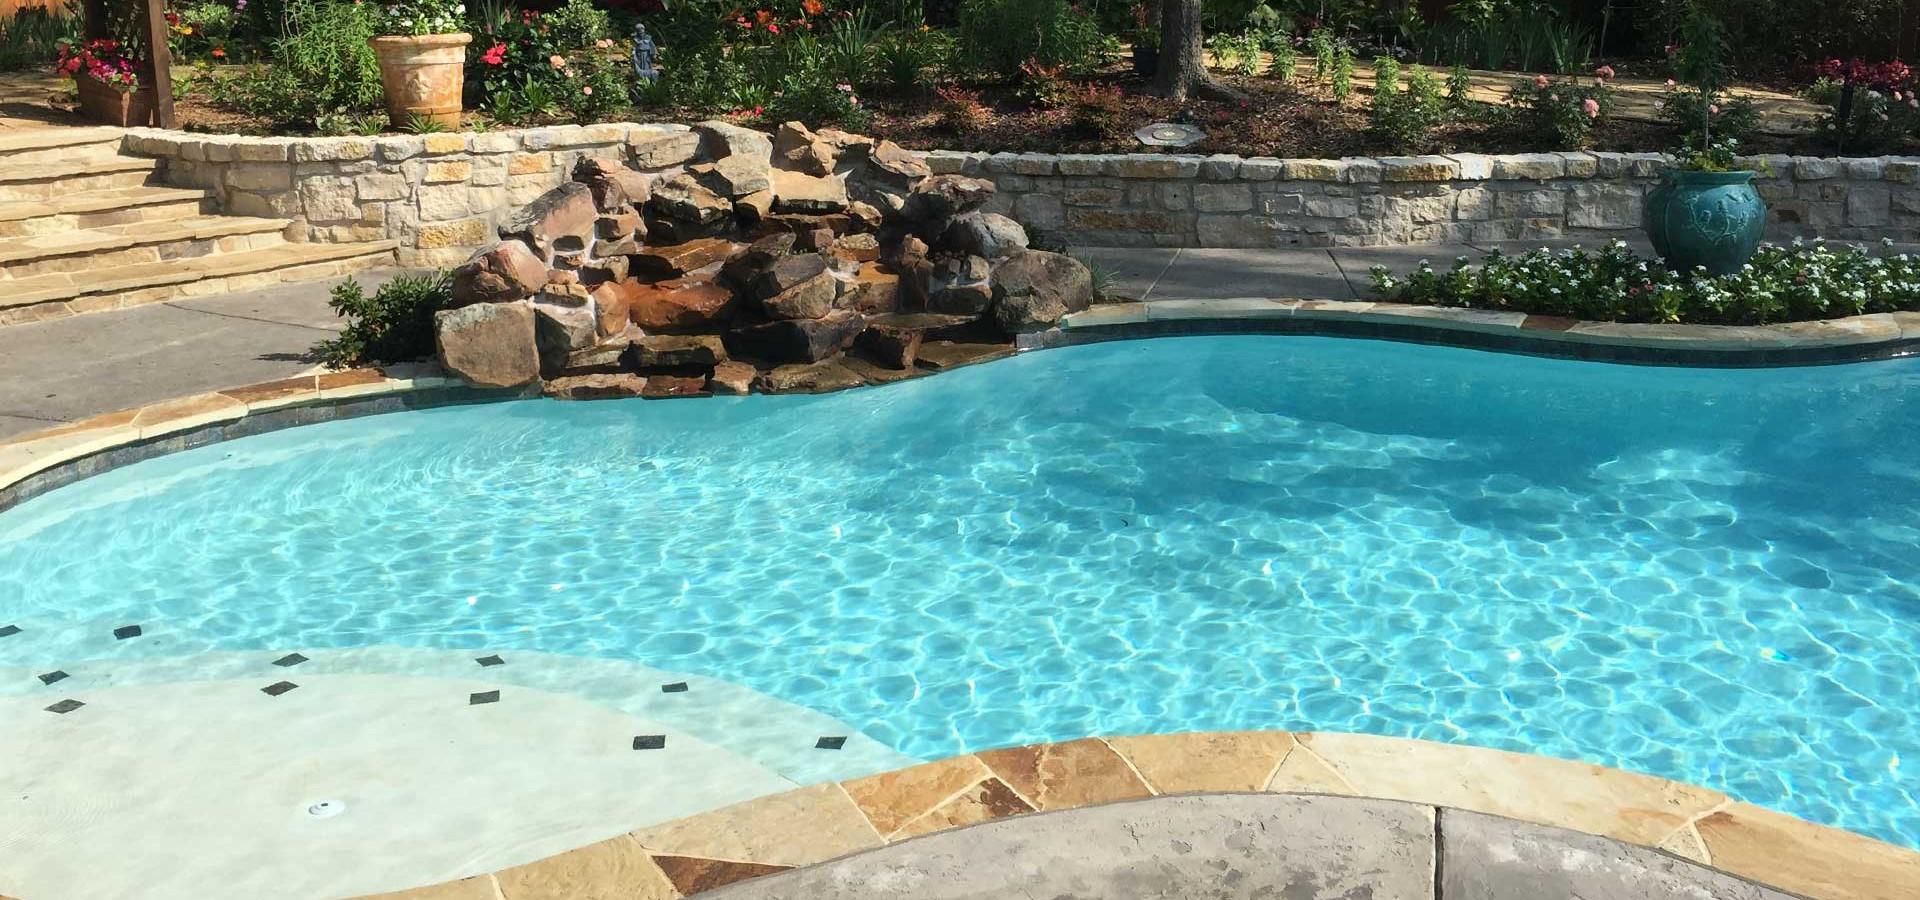 Custom Pool Builder - Tyler, East Texas | Flamingo Bay Pools